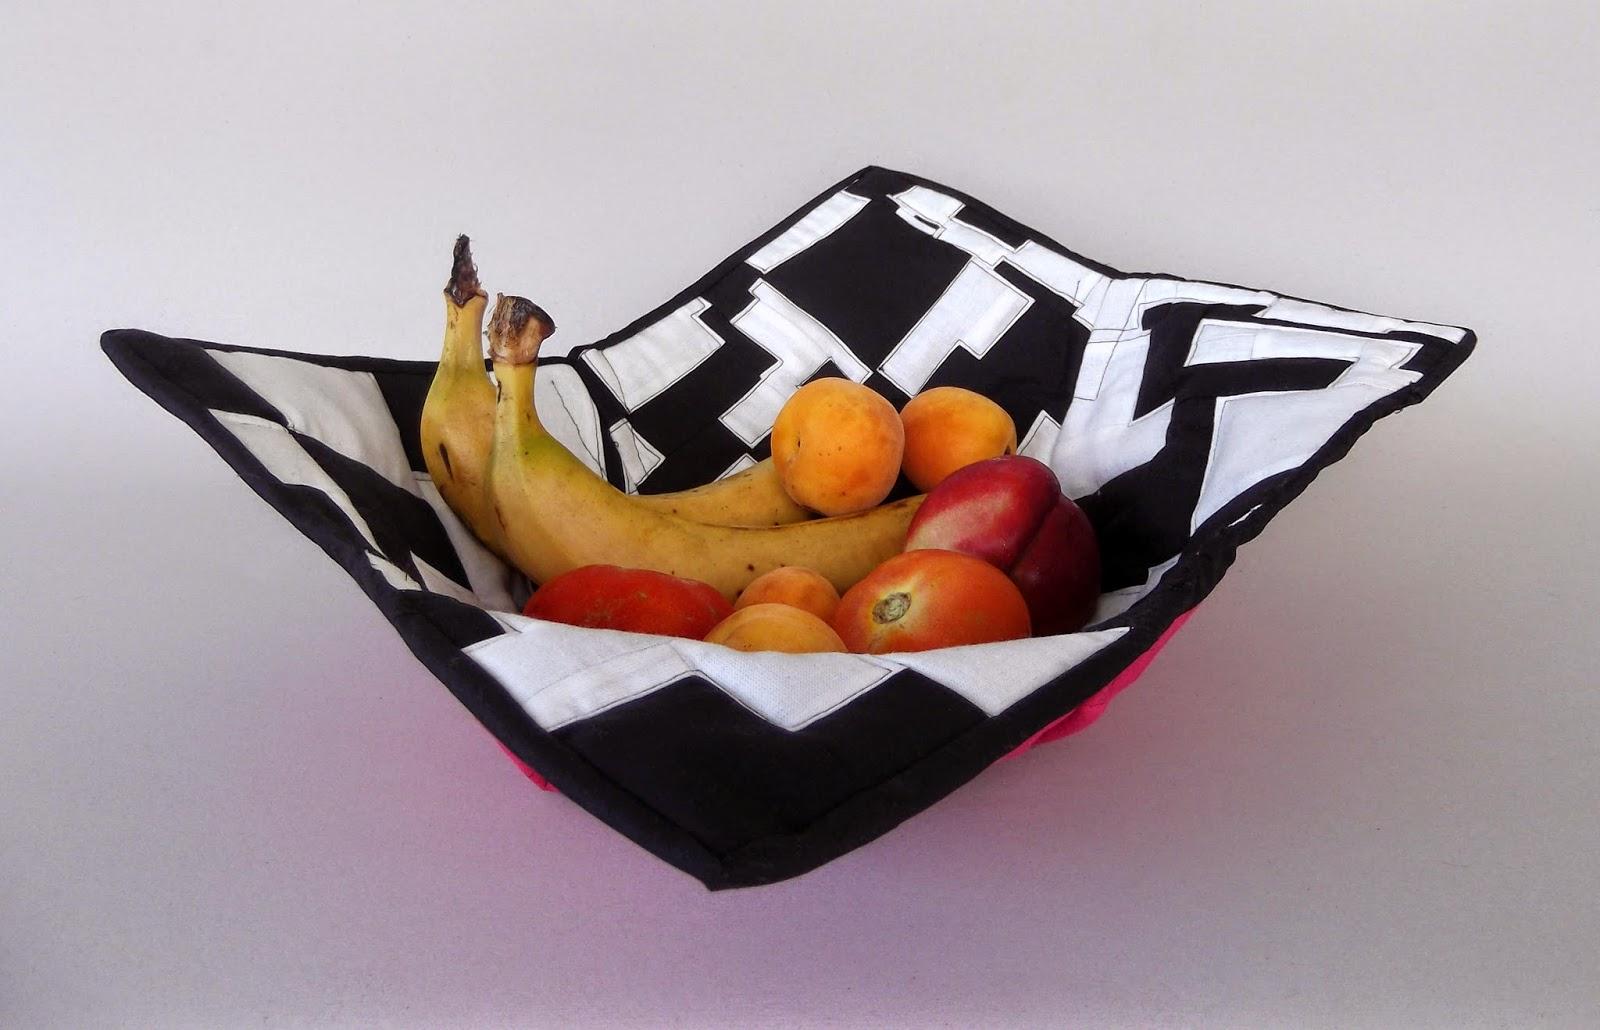 fabric basket, fabric bowl, fabric plate, fabric bread basket, textile bowl, textile basket